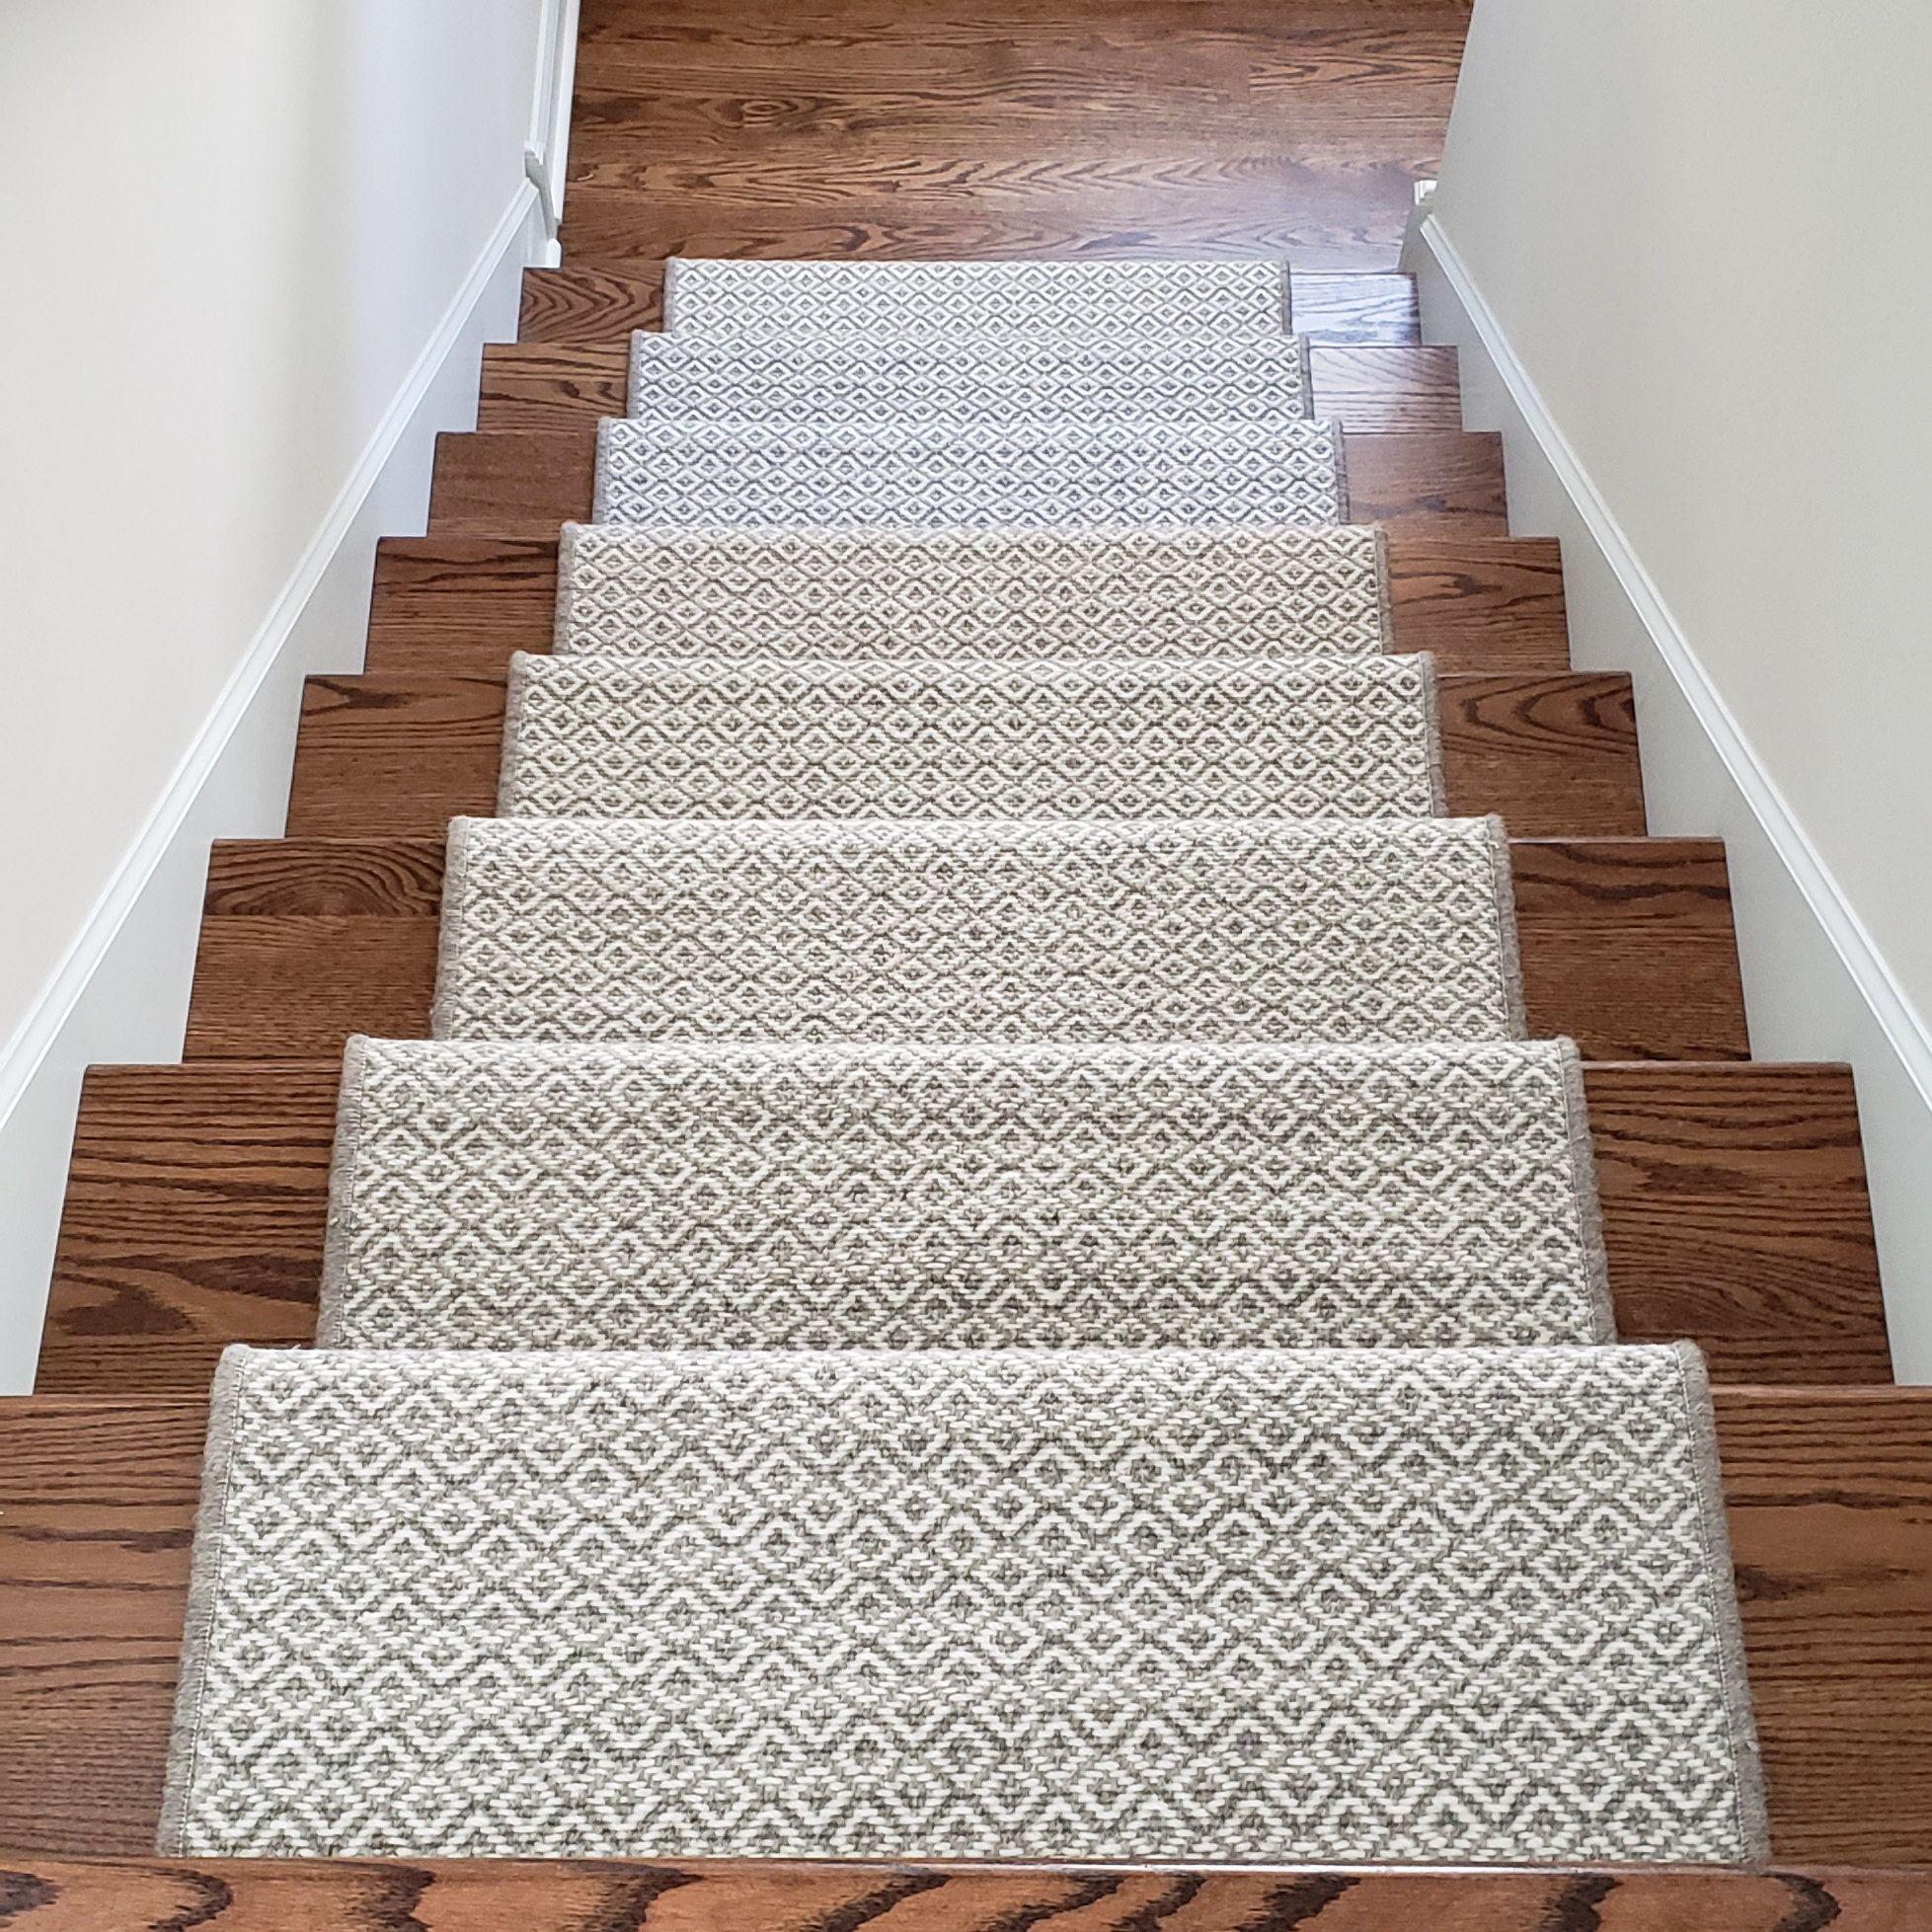 Padded Wool Carpet Stair Treads Breckenridge Grey Medium Etsy | Stair Tread Carpet Tiles | Treads Lowes | Slip Resistant | Non Slip | Tread Covers | Walmart